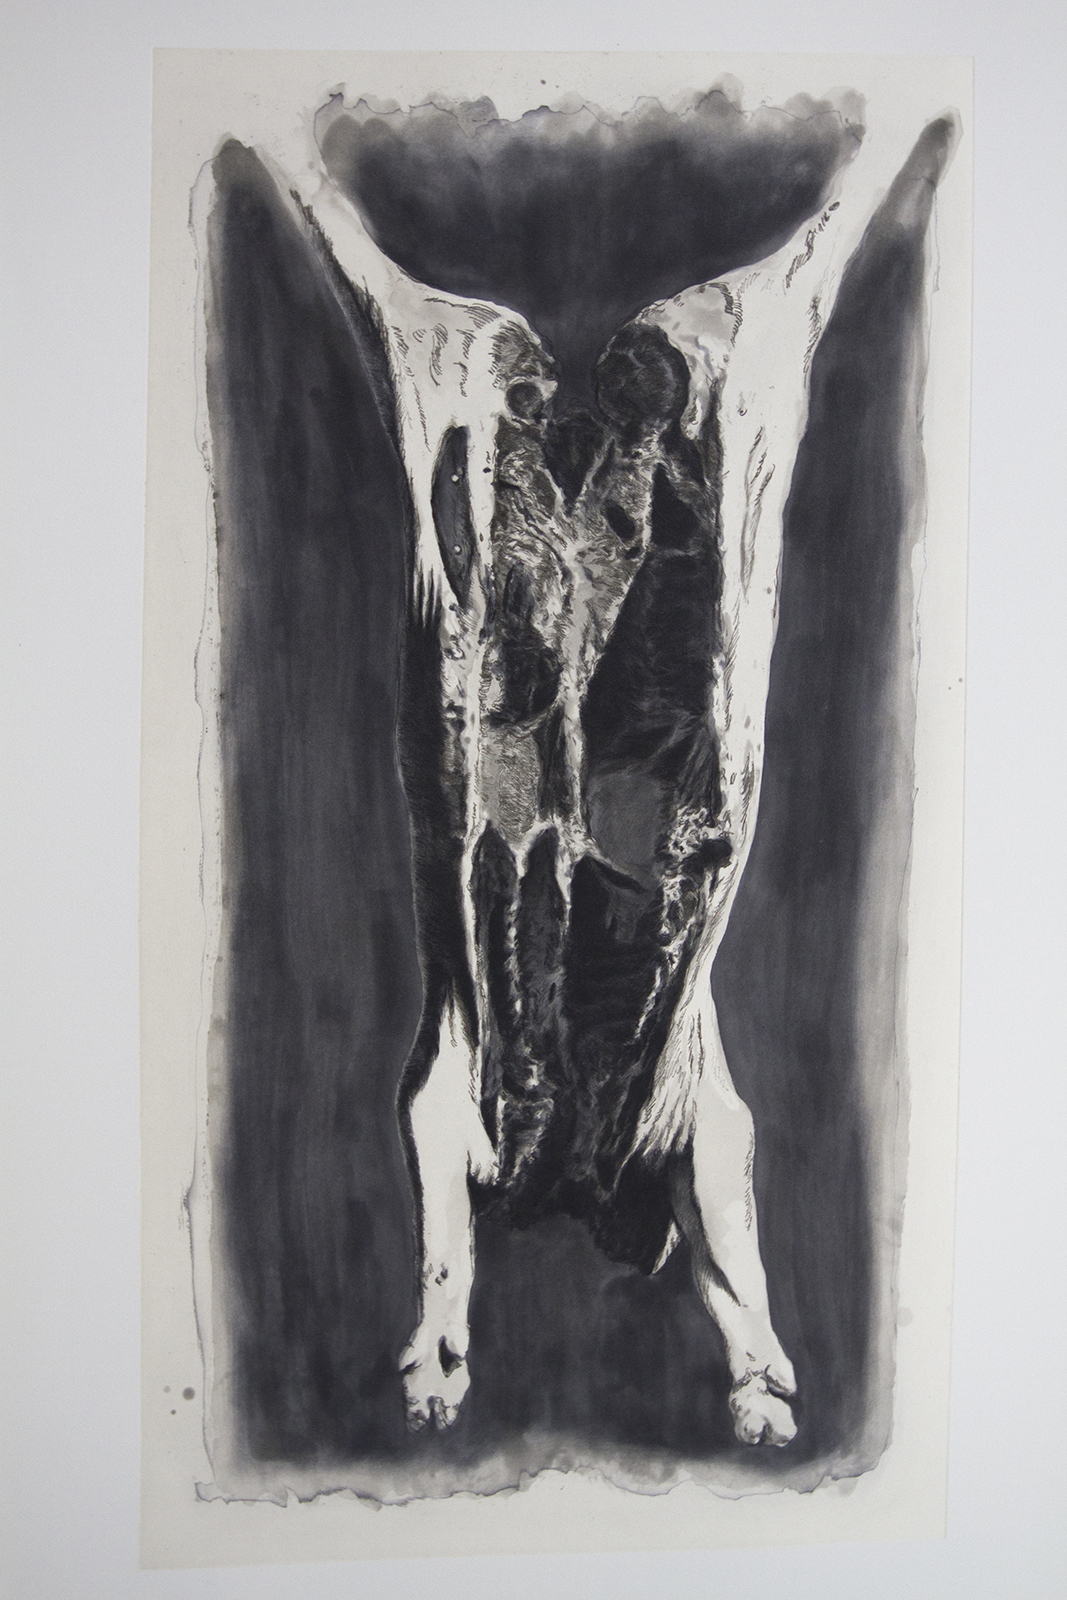 Carcass (Monochrome)